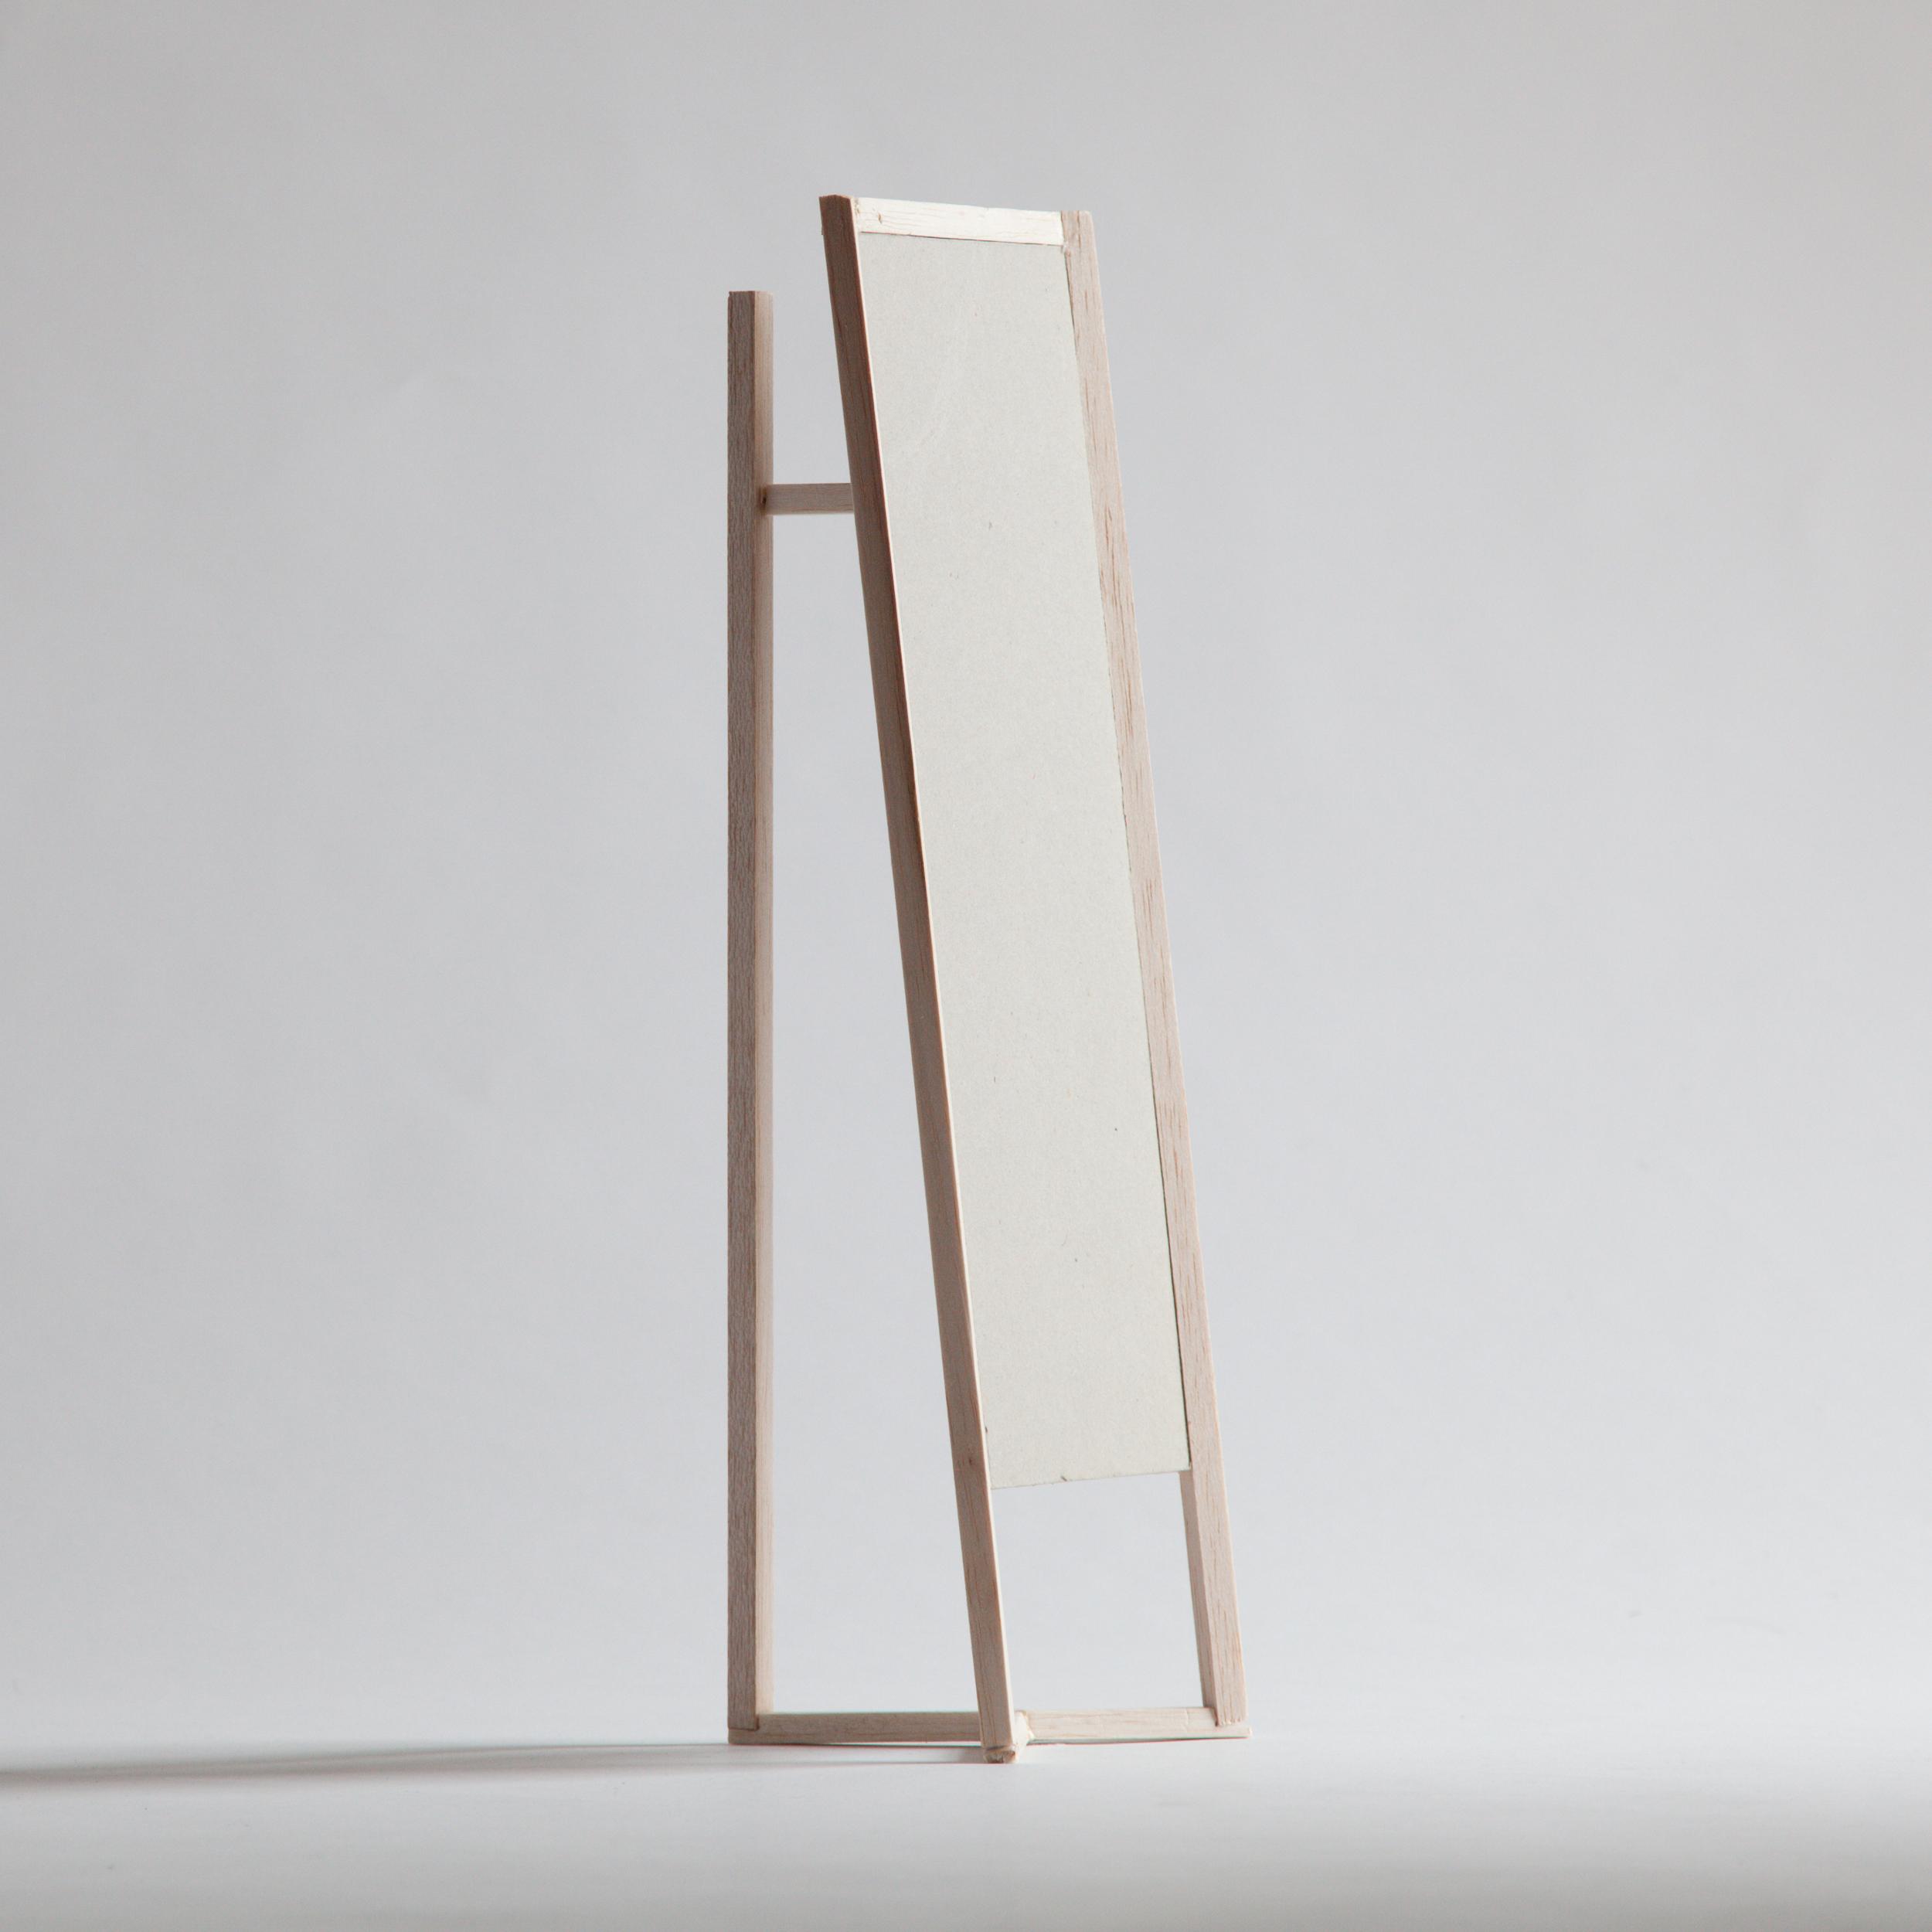 Scale Model of Club mirror by Debiasi Sandri for Schoenbuch